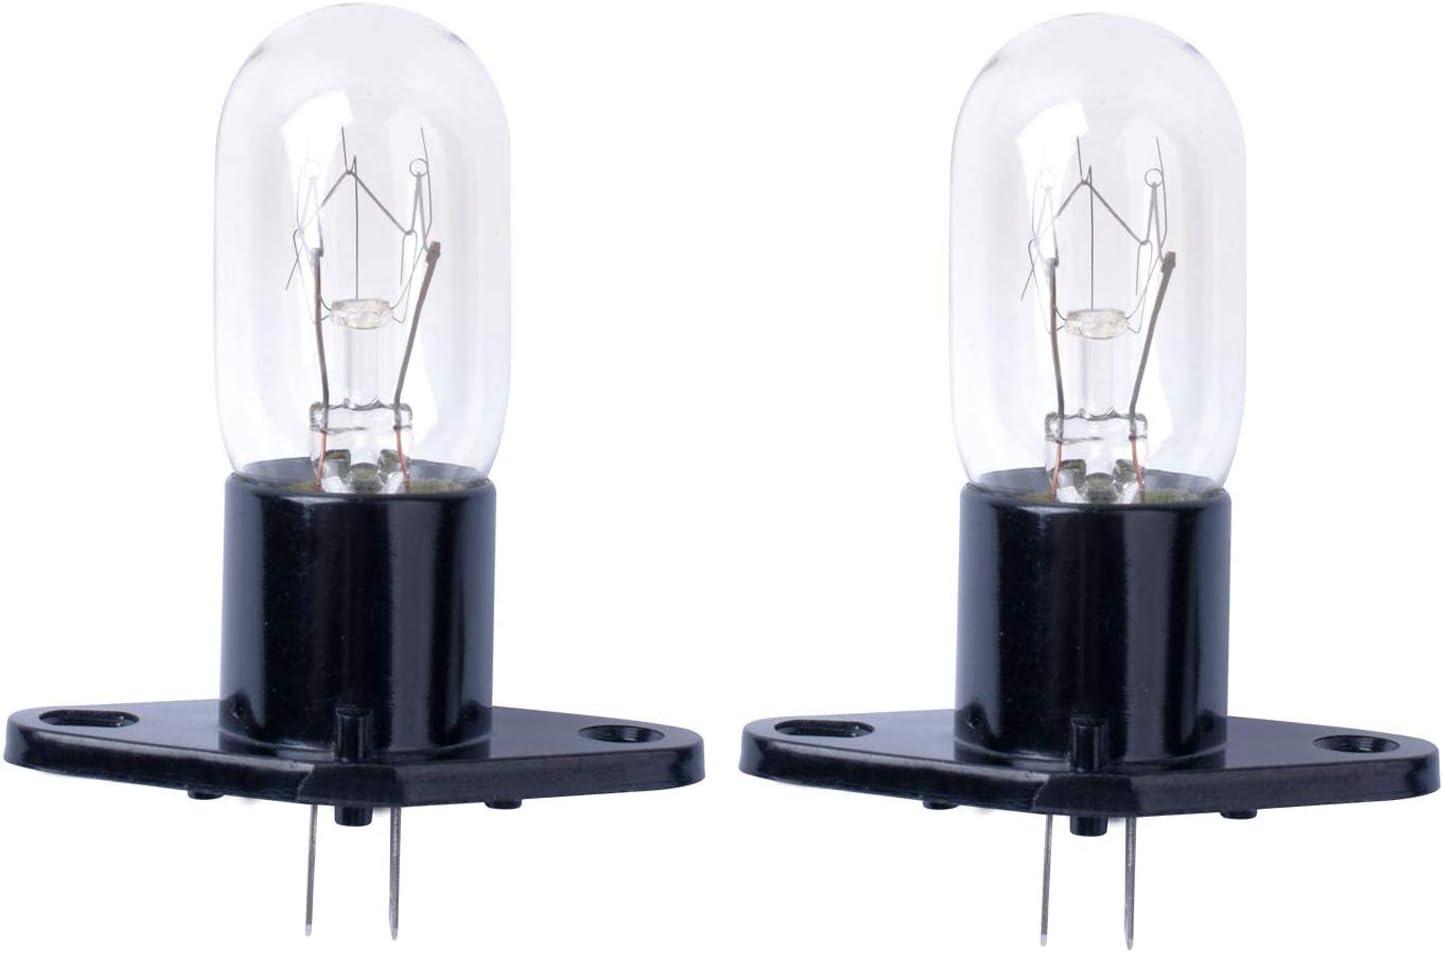 Poweka Bombilla de Microondas 20W 240V T170 para Horno de Microondas Bosch, LG, Panasonic, Siemens, Neff (2 Piezas)